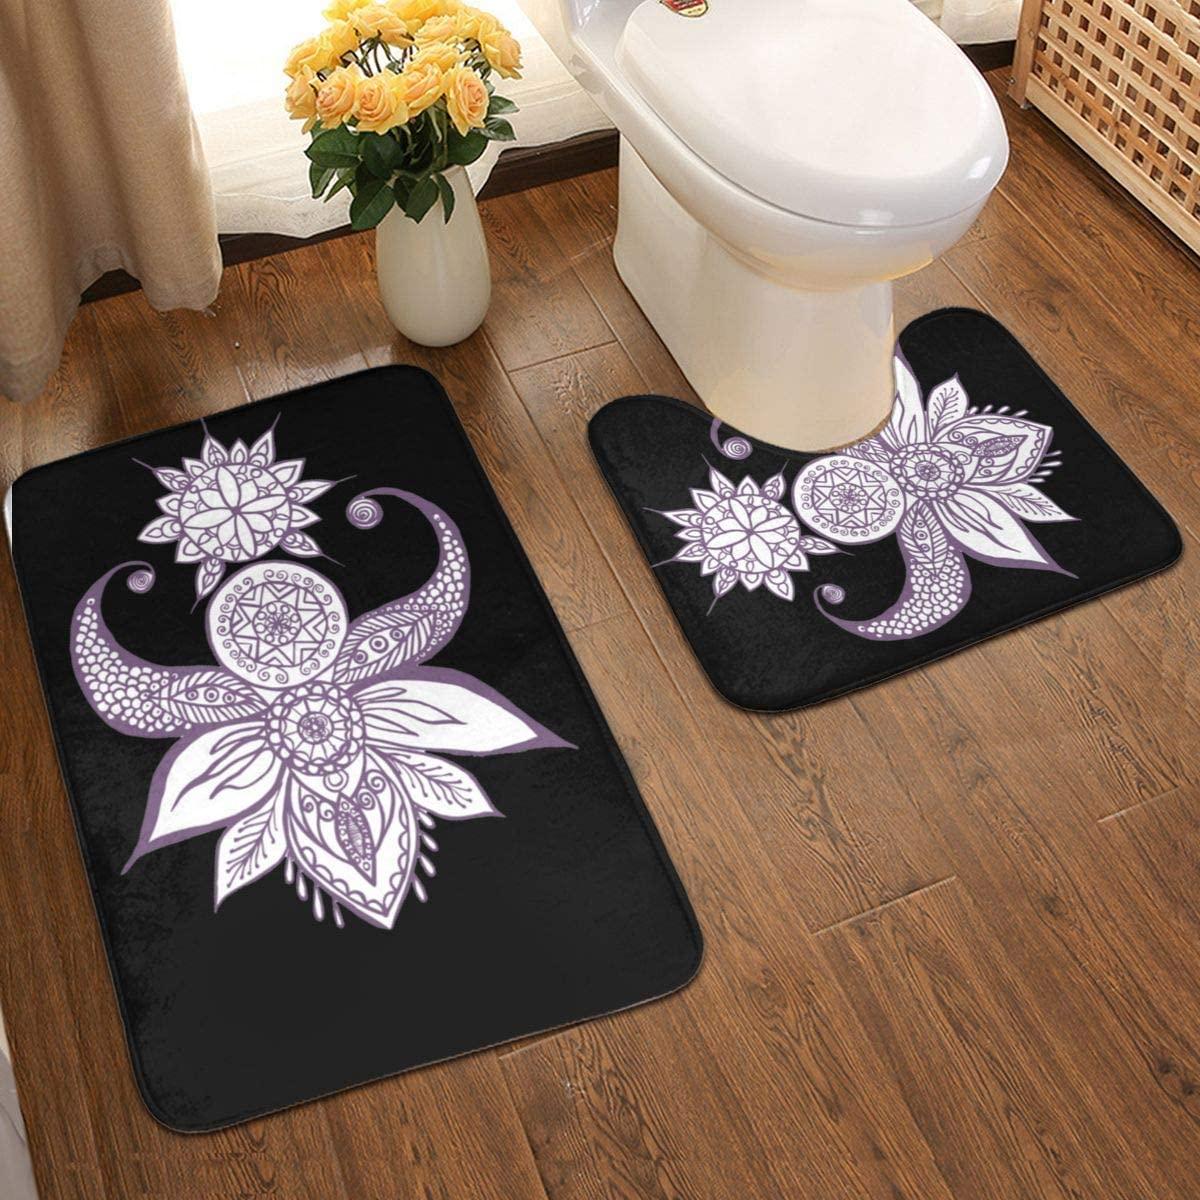 Yoga Bathroom Antiskid Pad Non-Slip Bath Carpet Floor Mat Rug 2 Sets -Floor Mat+U-Shaped Pad, Toilet Washable Blanket Mats for Bathroom Home Shower